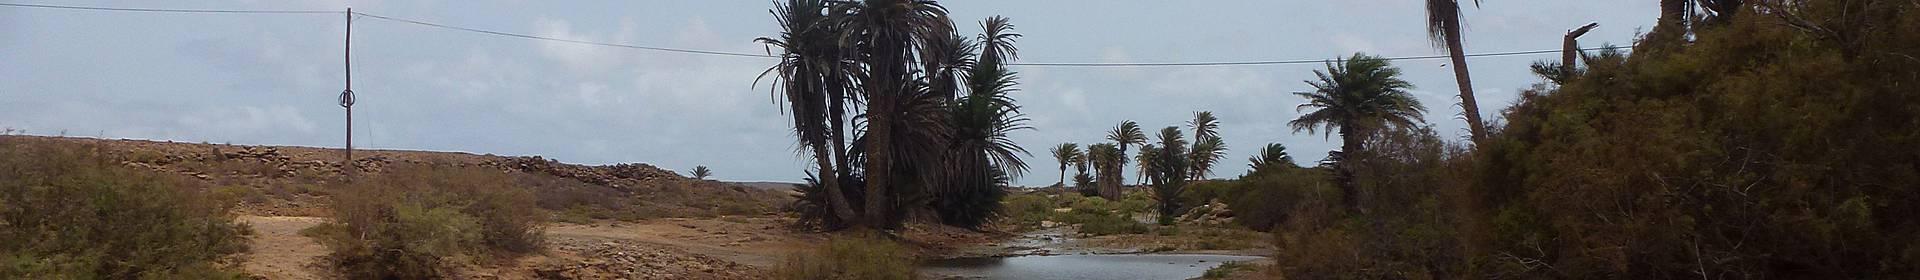 Les îles Barlavento